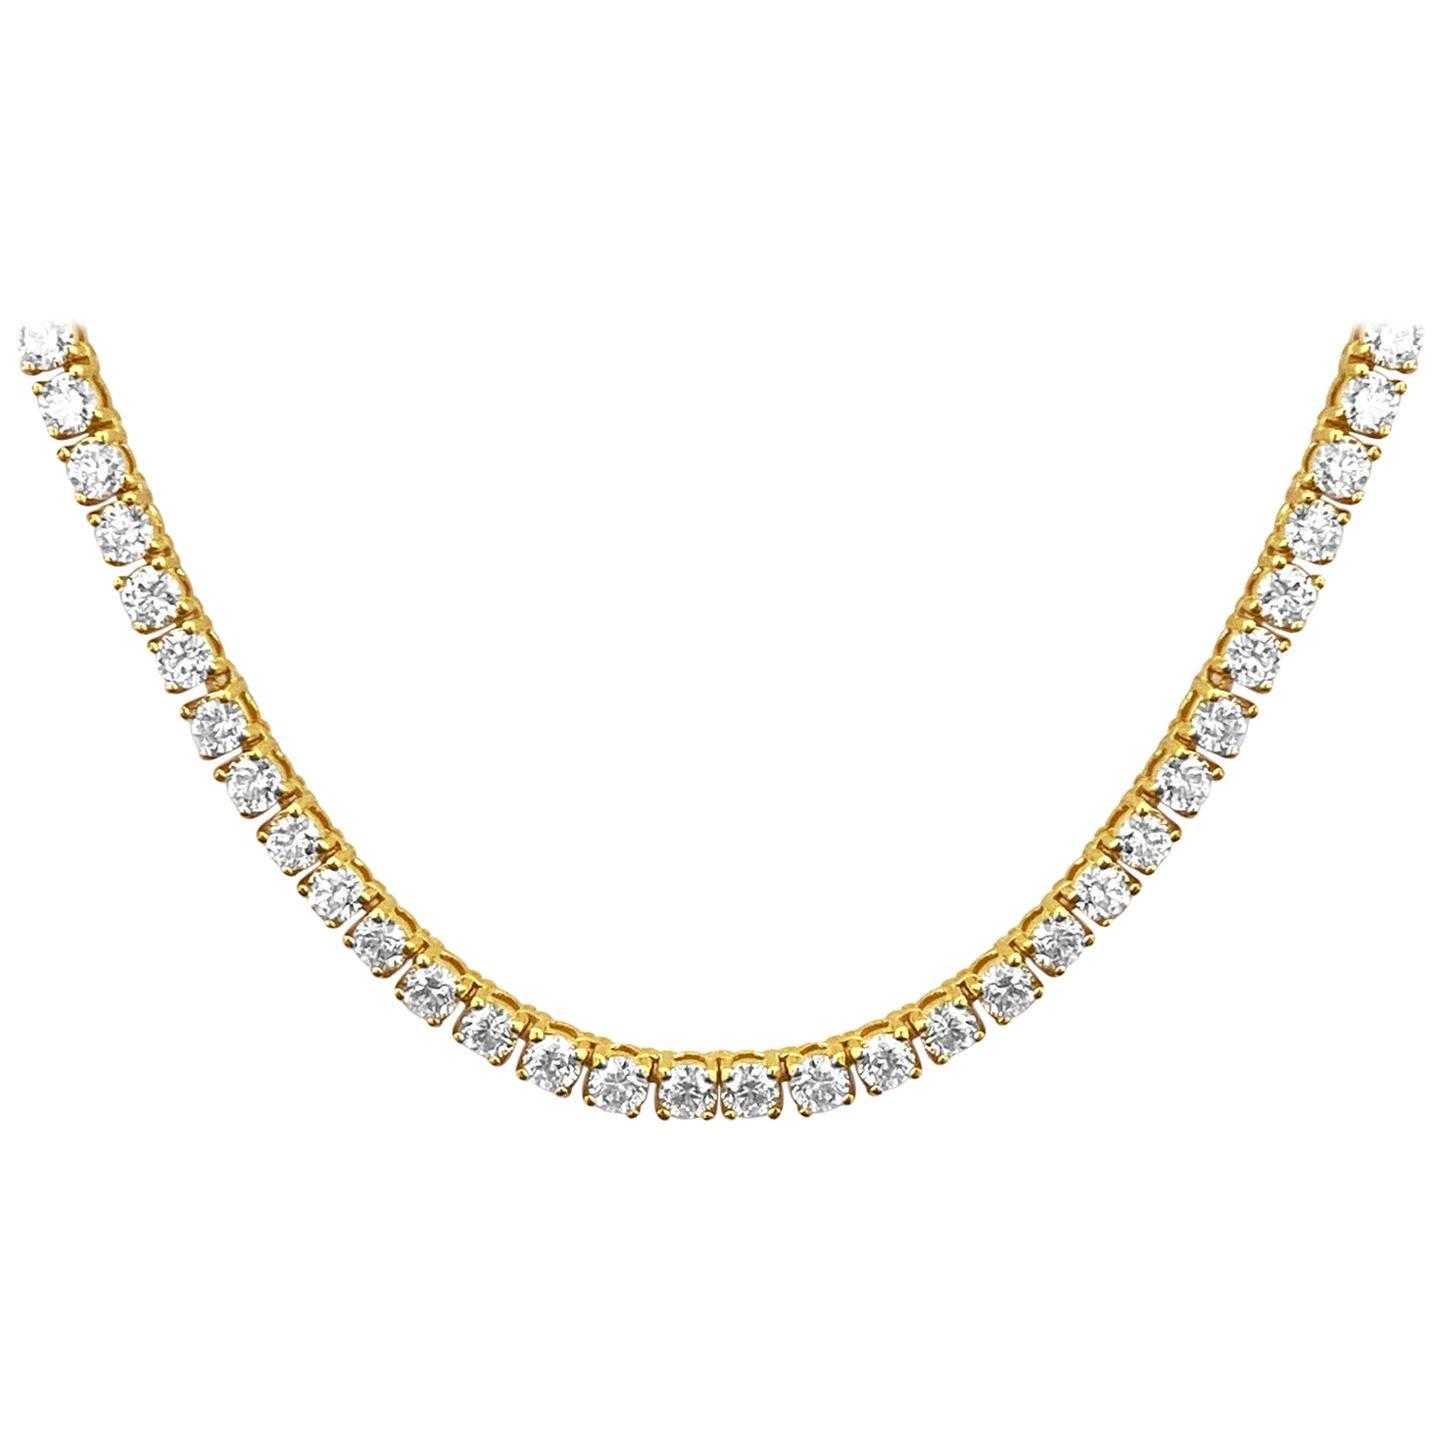 18 Carat VVS Diamond Tennis Necklace 14 Karat Yellow Gold Unisex Necklace